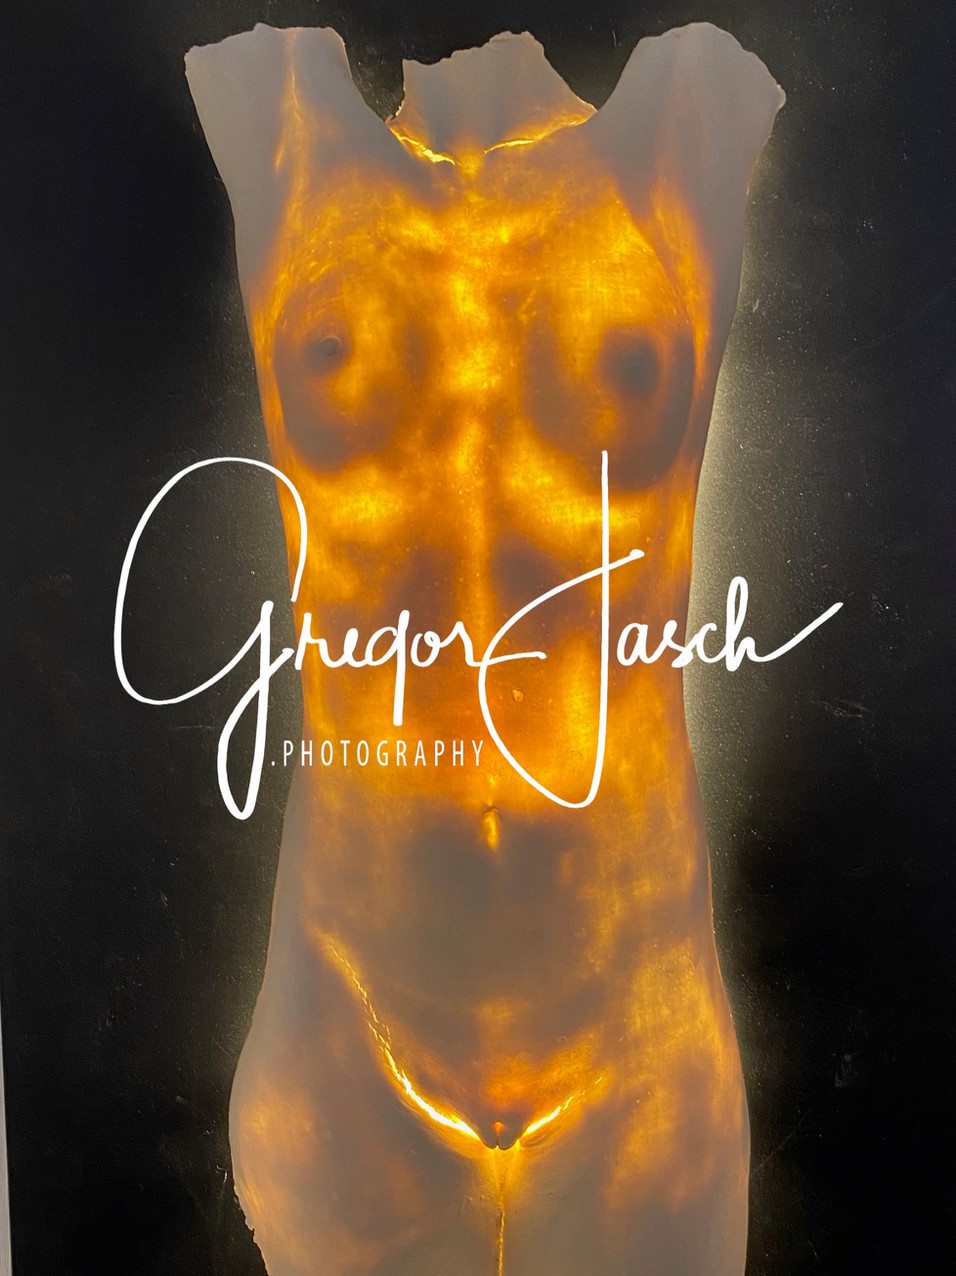 Buy_online_pictures_of_Visual_Art_gregorjasch.photography